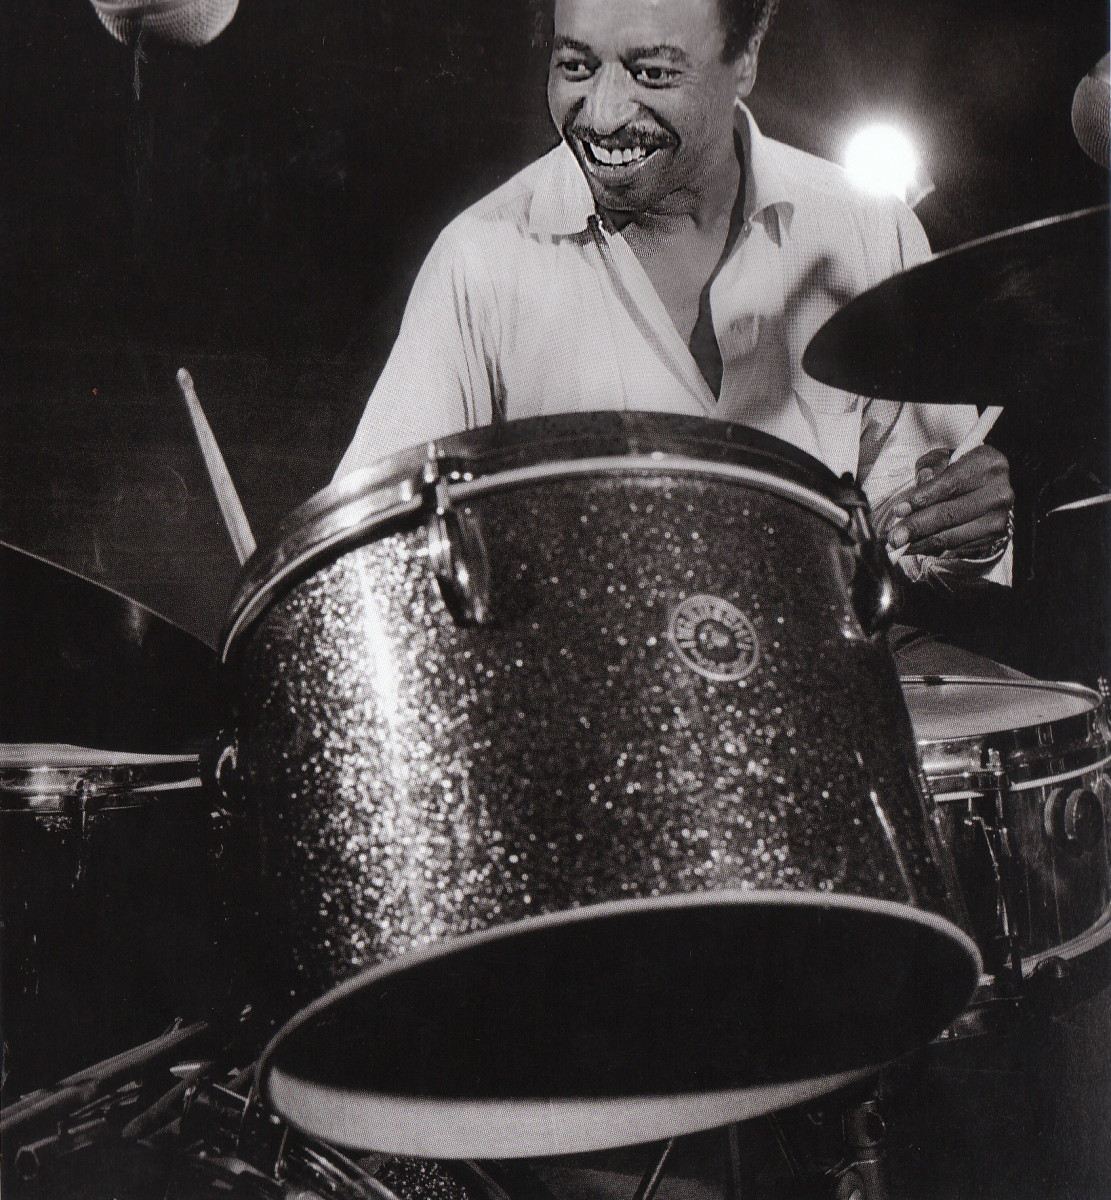 Chico Hamilton at a Rudy Van Gelder's studio recording session for Impulse!, New York City, 1963.